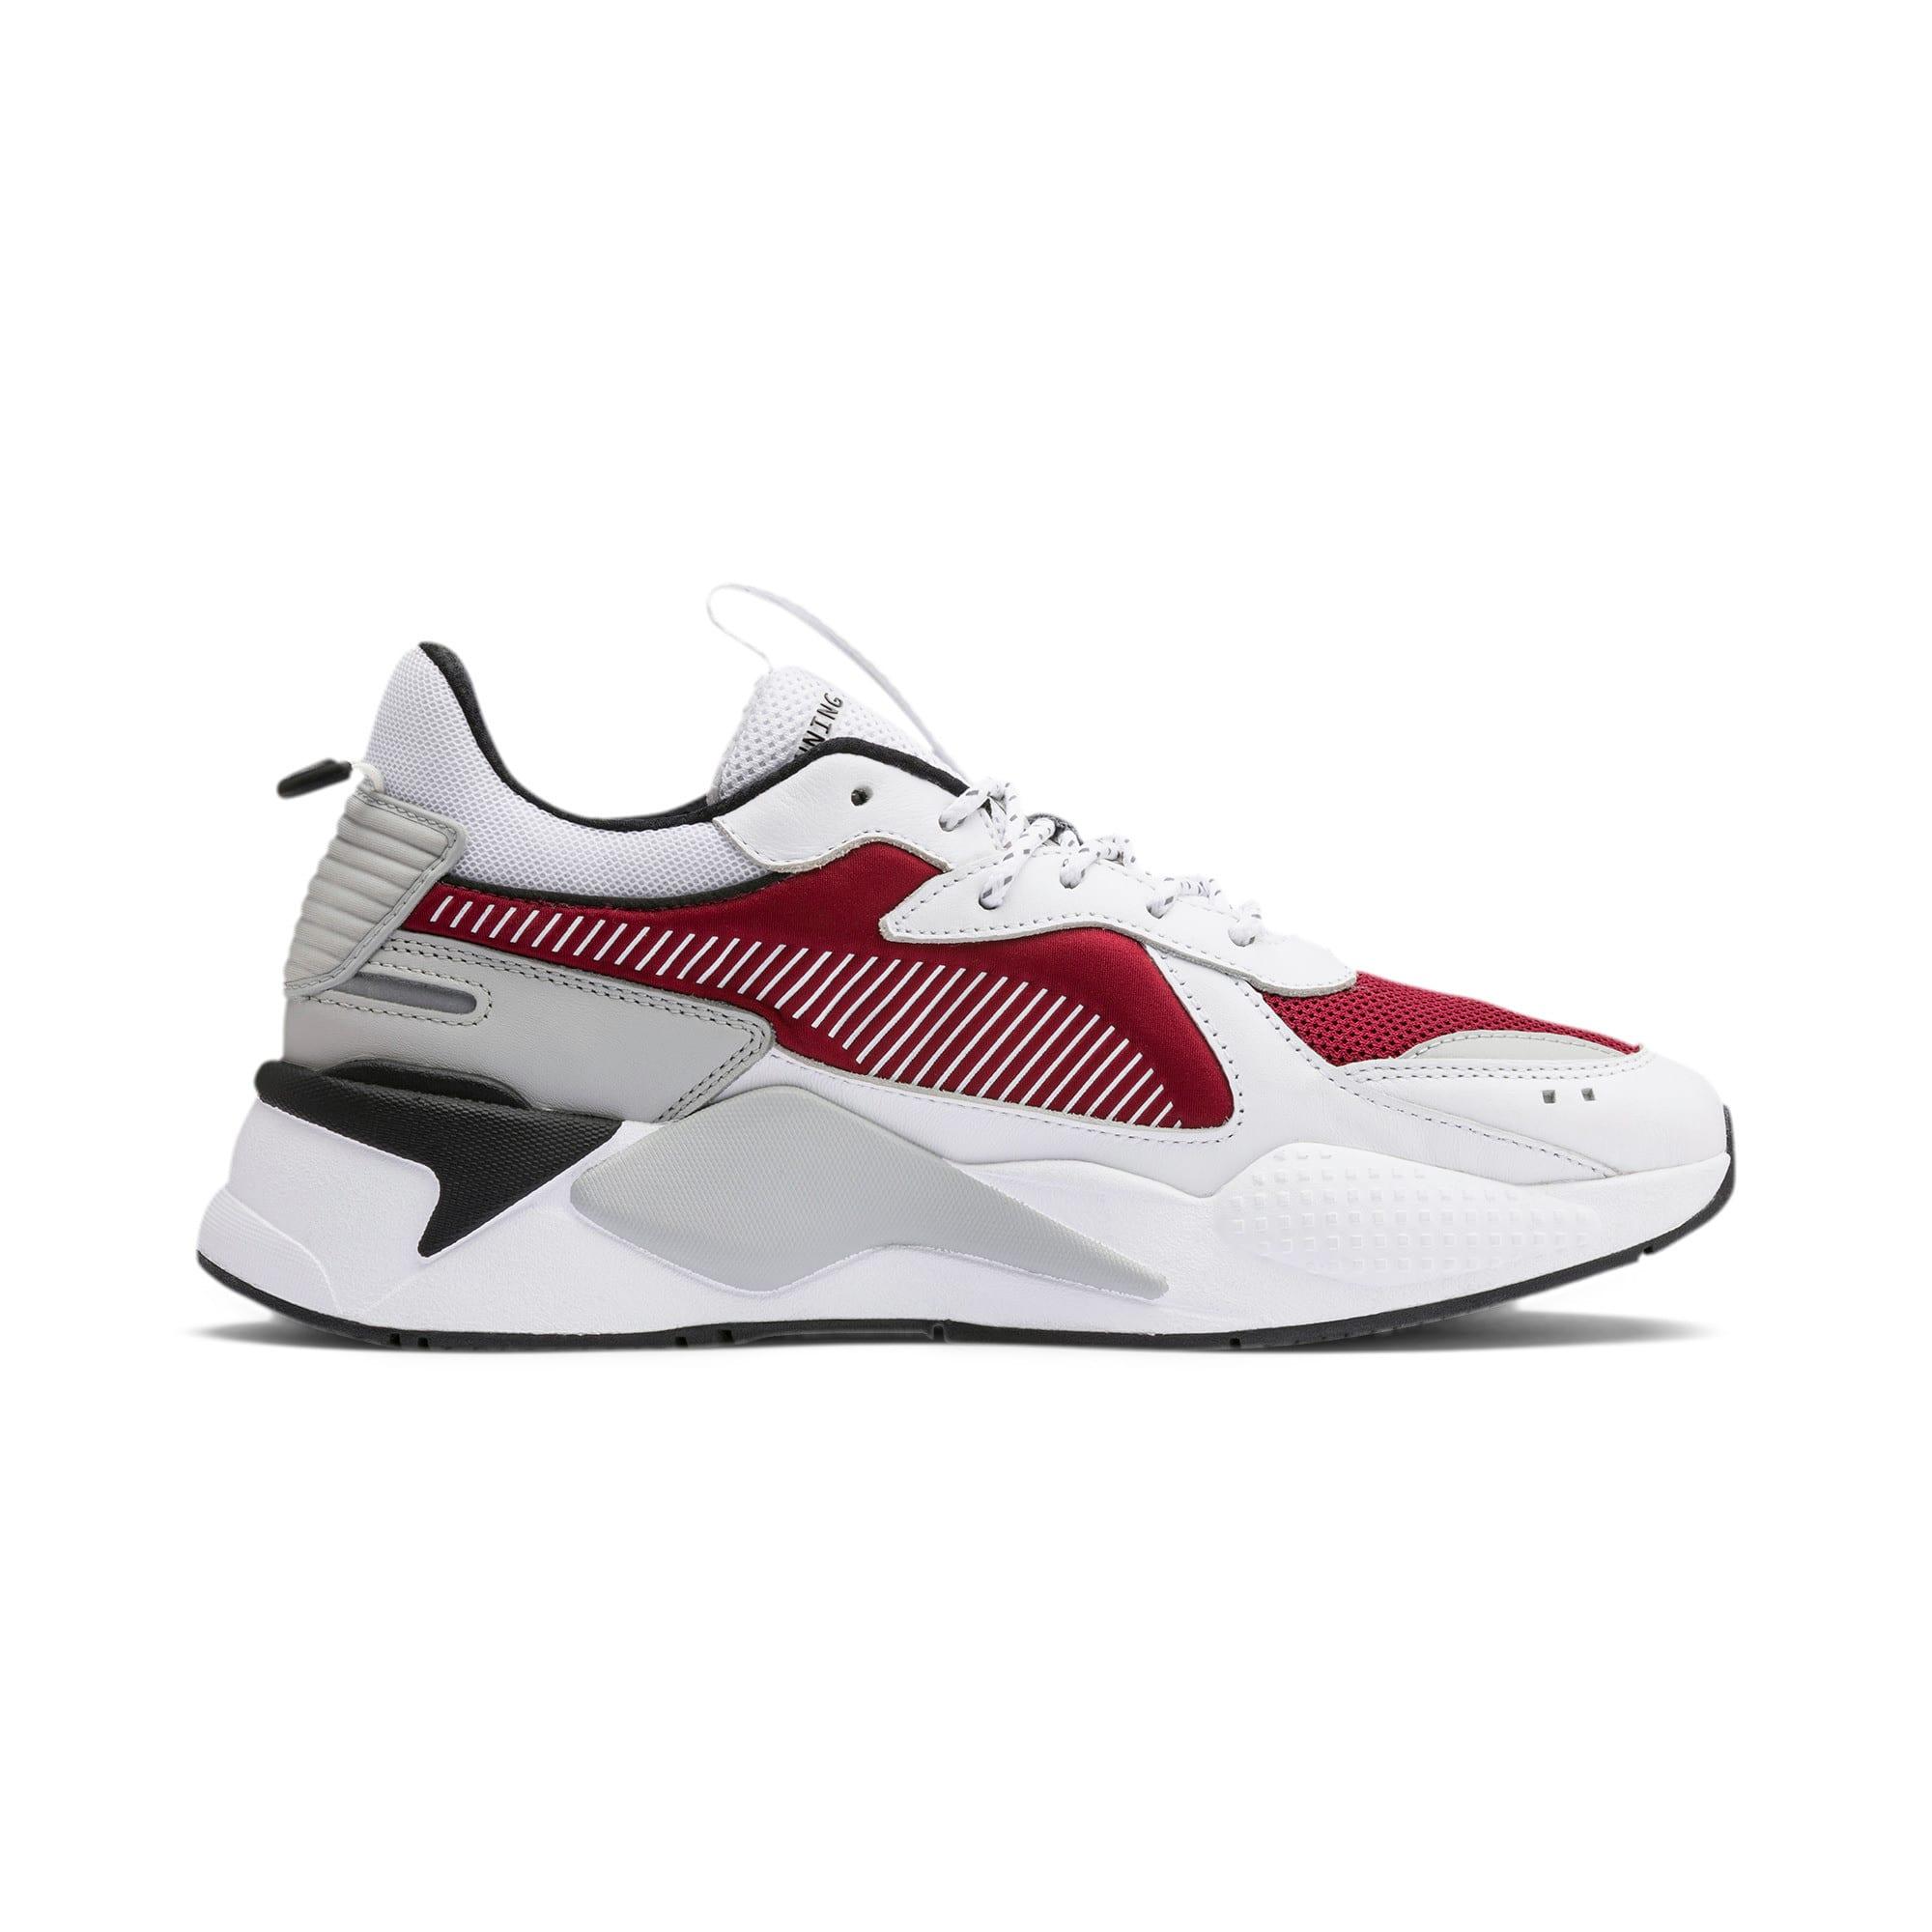 Thumbnail 6 of RS-X Core Sneakers, Puma White-Rhubarb, medium